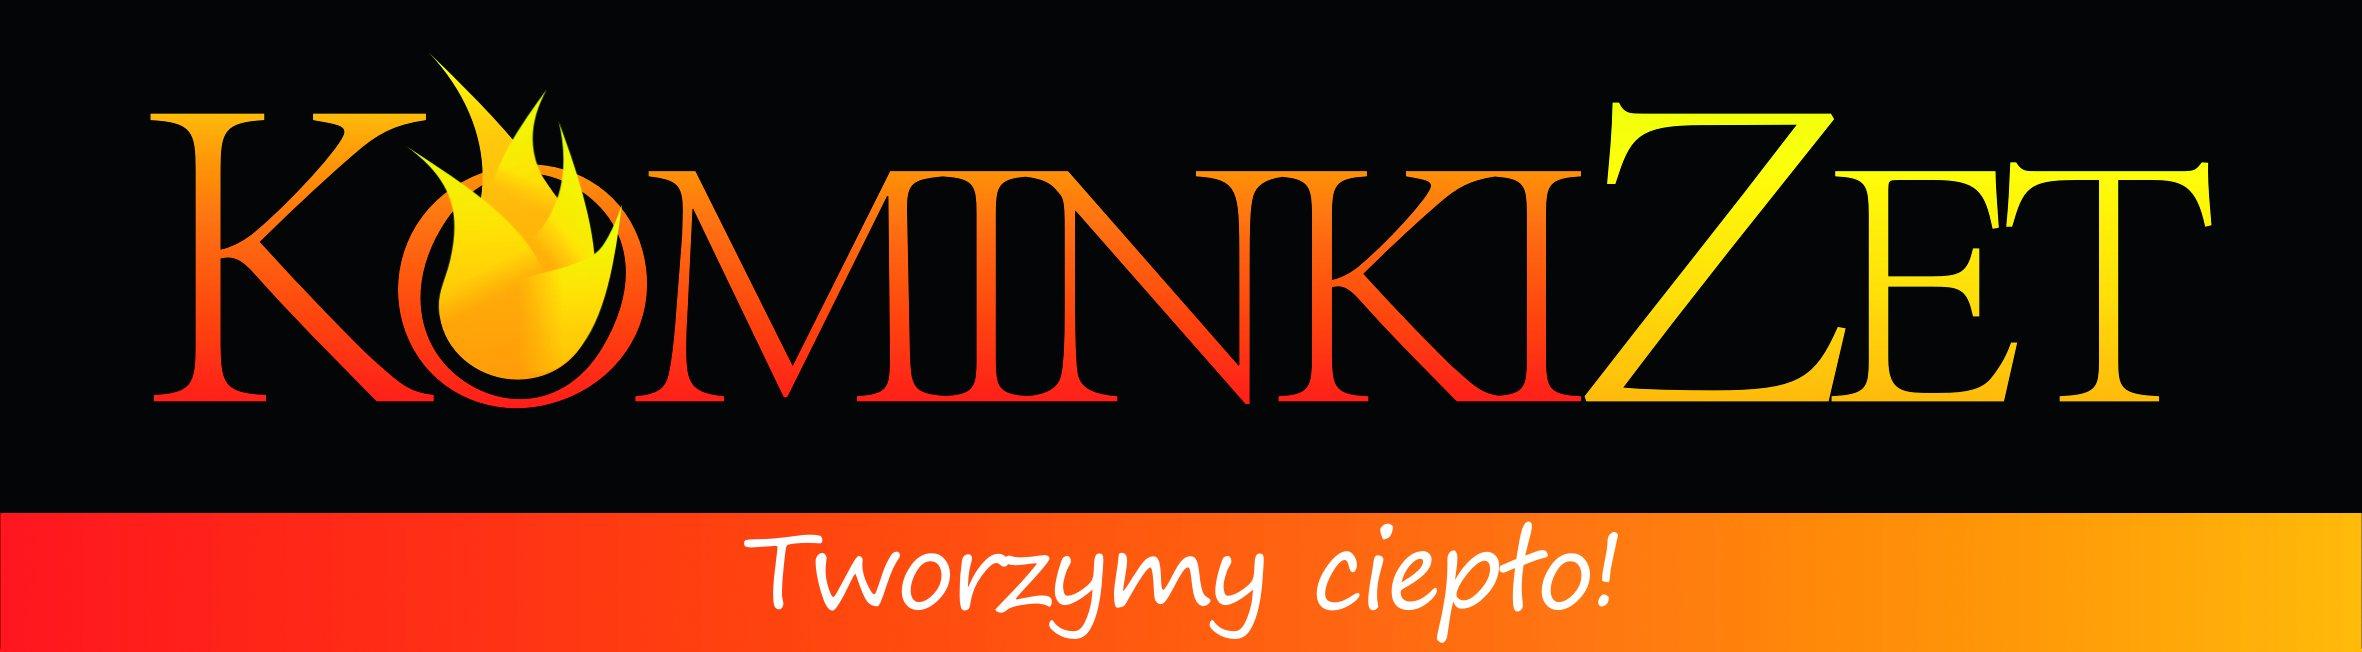 KOMINKIZET_logo (1) (1)